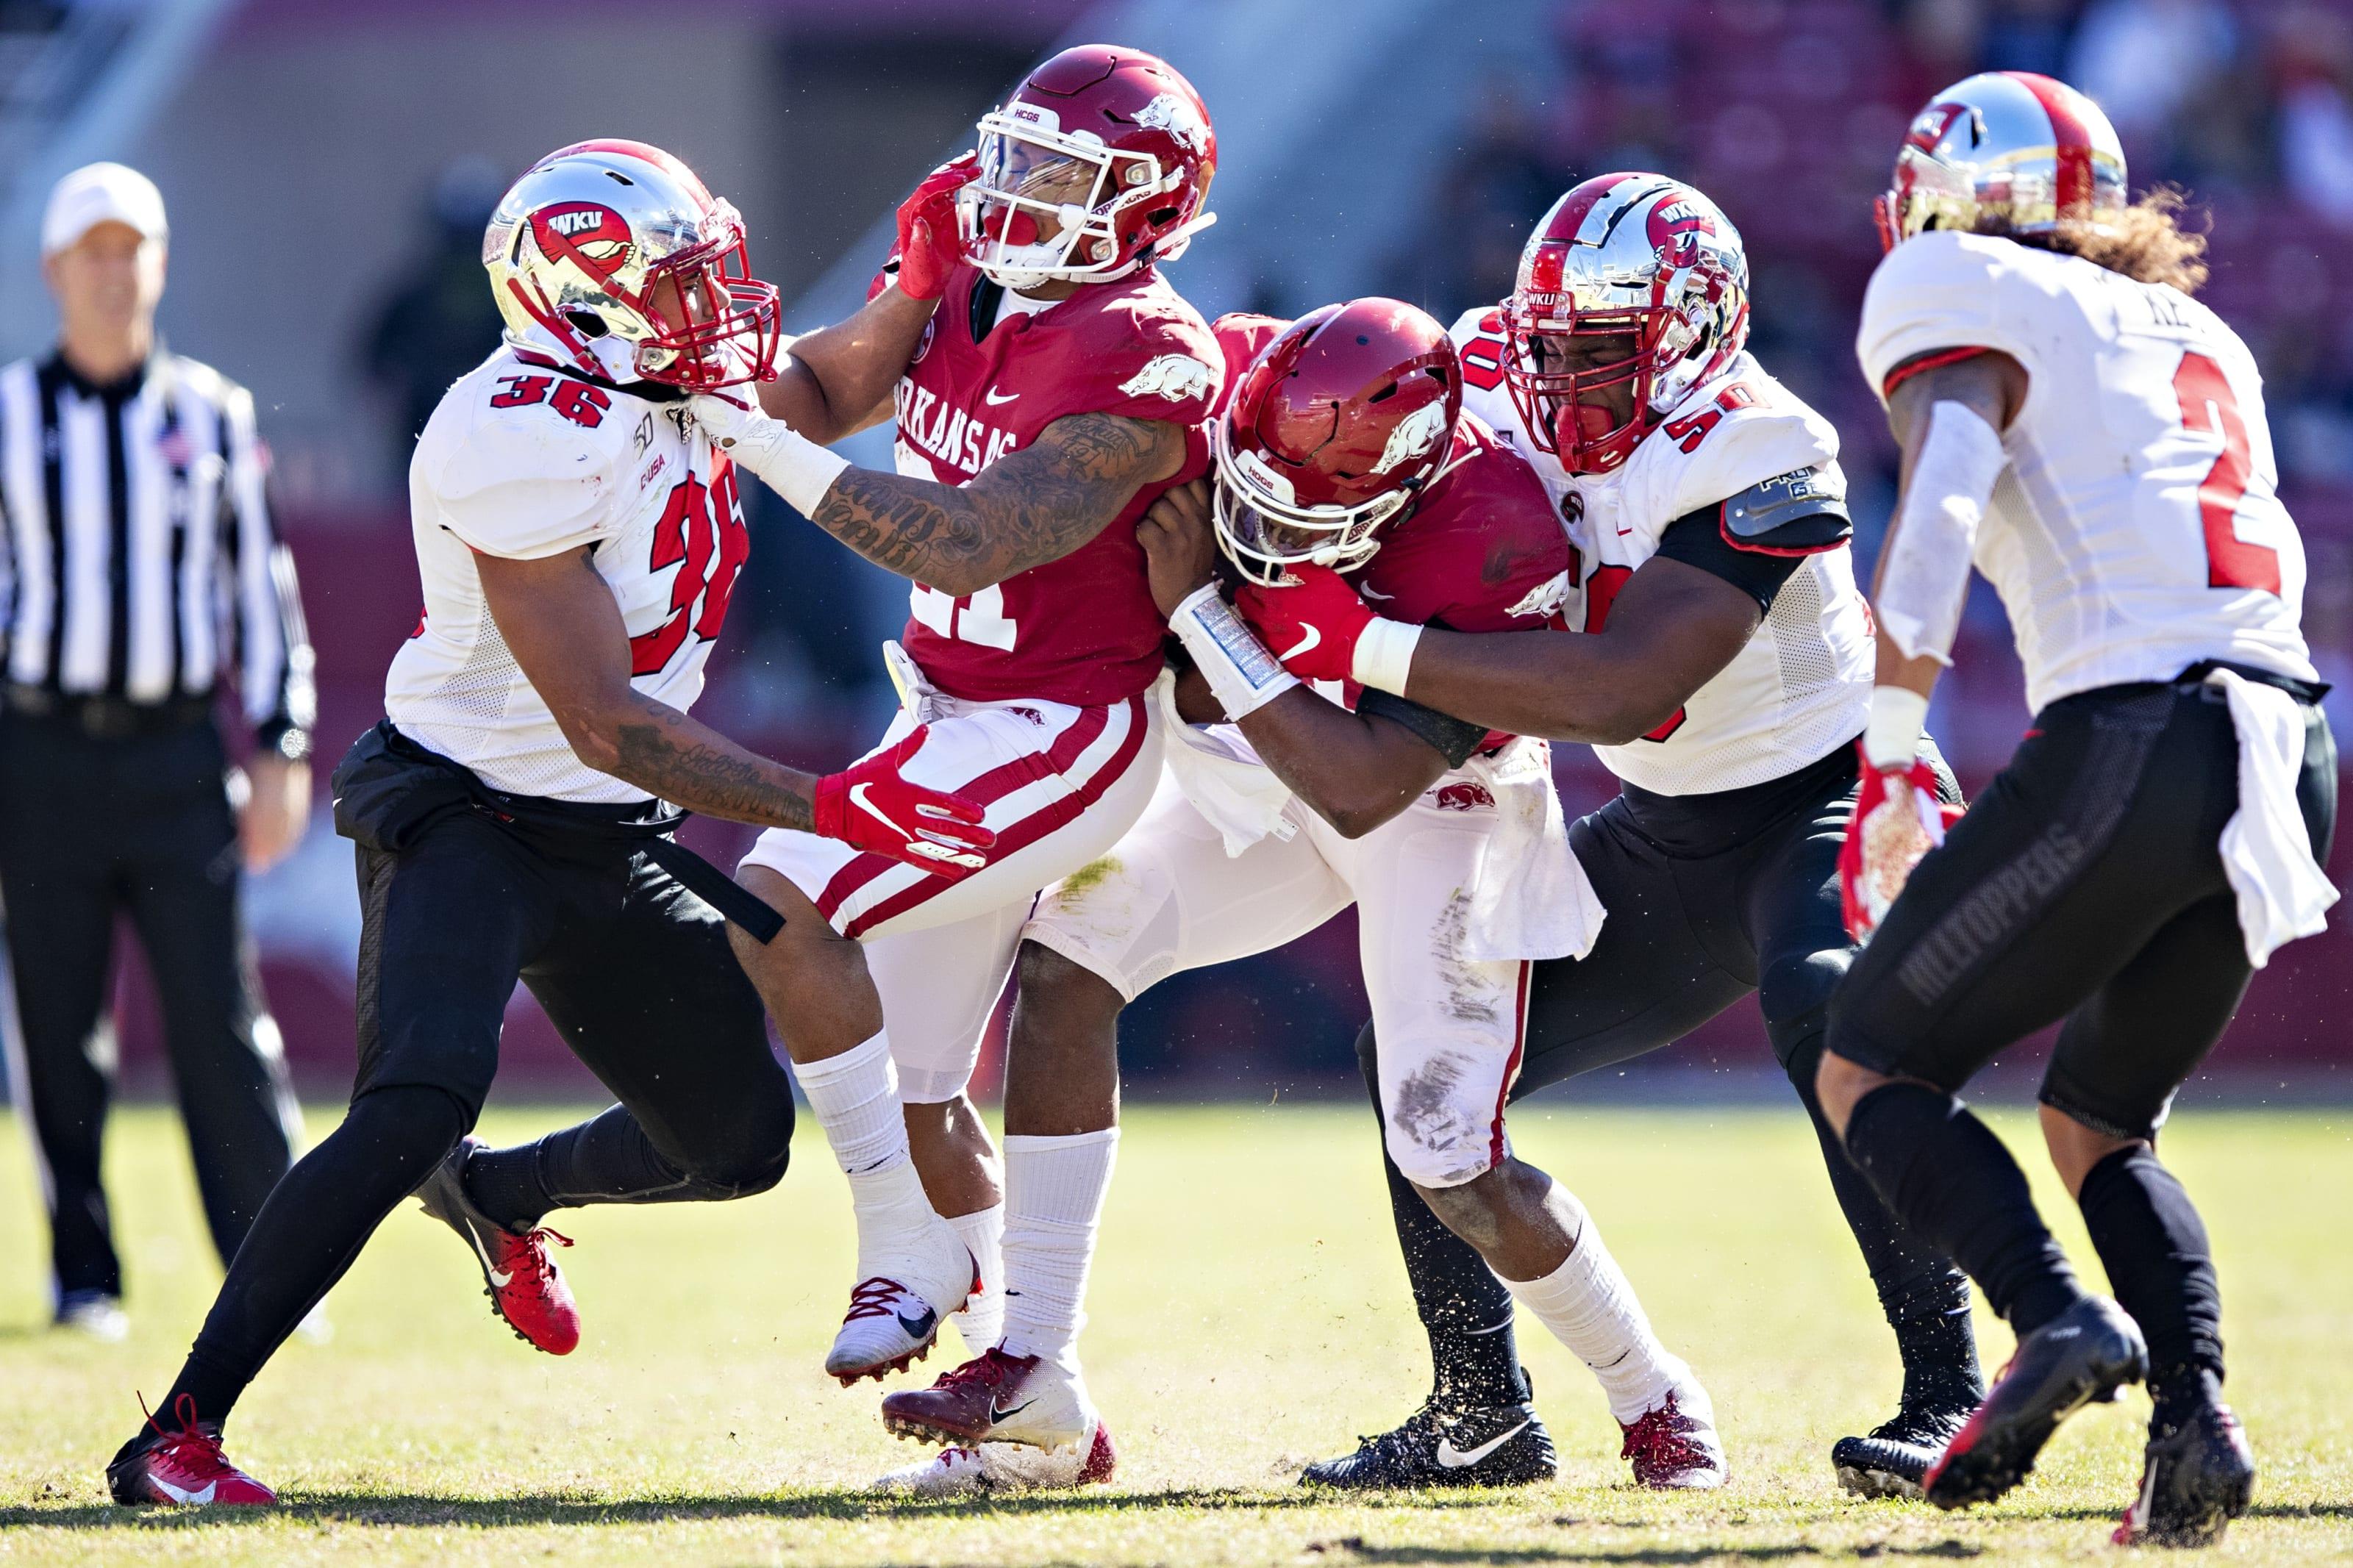 Louisville football vs WKU: 4 opposing players to watch ...